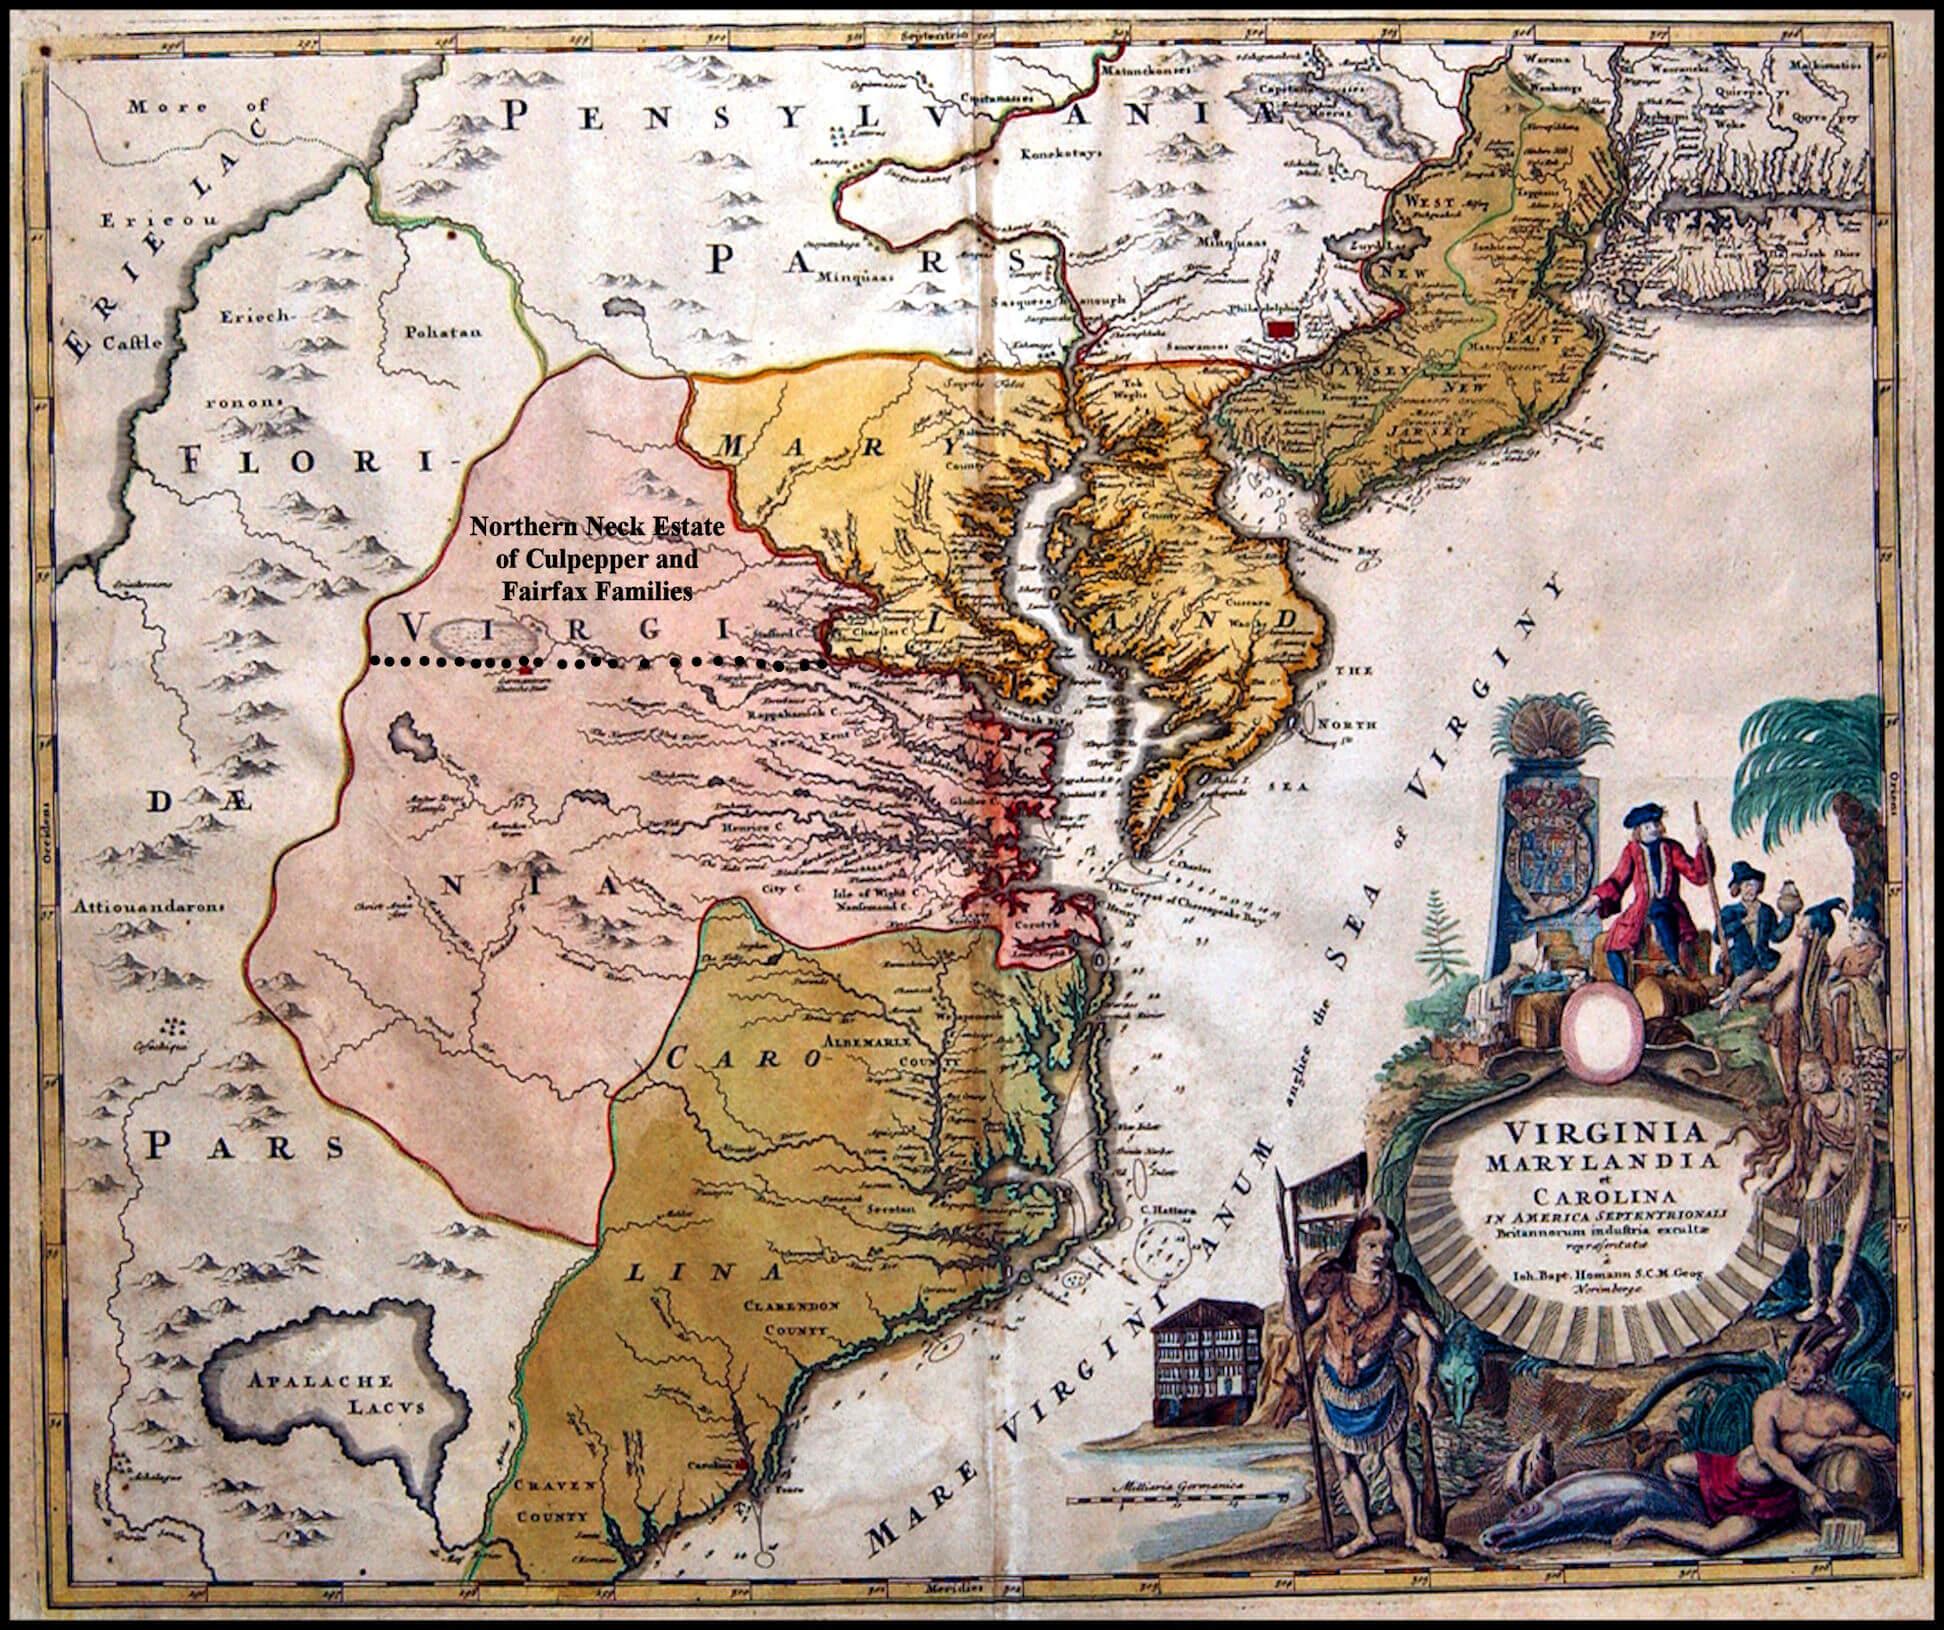 Maryland Native Plants: Native Americans Of The Shenandoah Valley